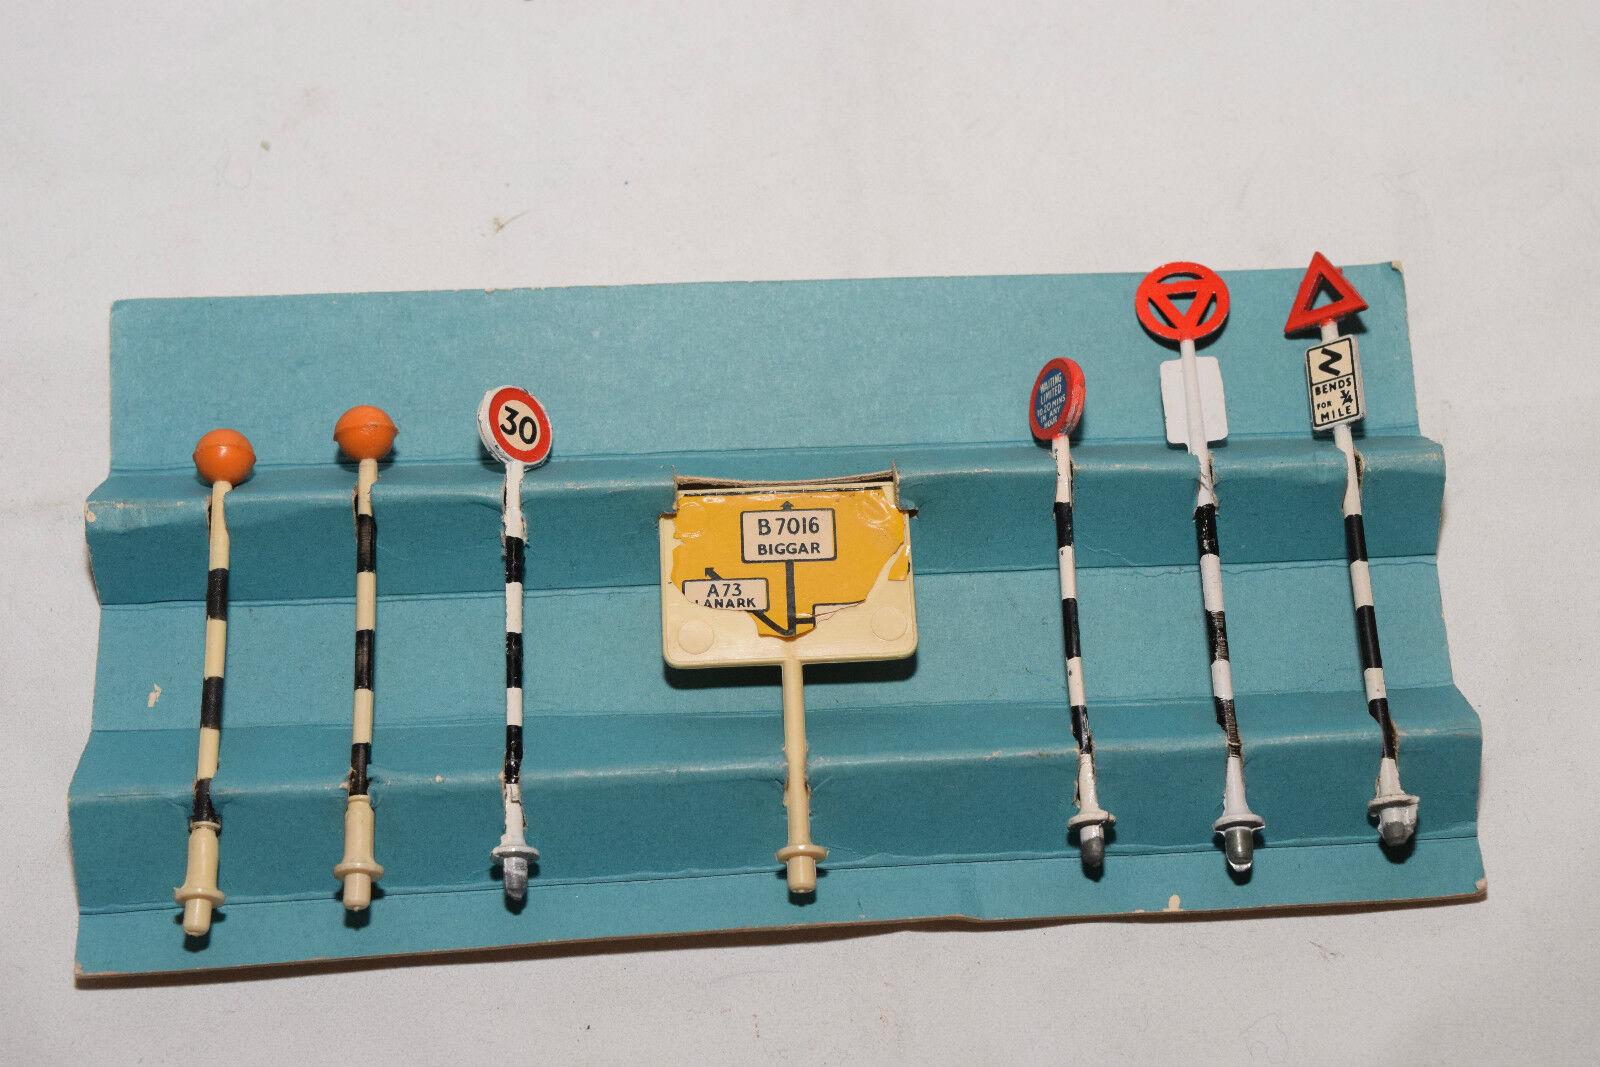 SPOT-ON SPOT ON SPOTON TRAFFIC SIGNS EXCELLENT BOXED RARE SELTEN RARO